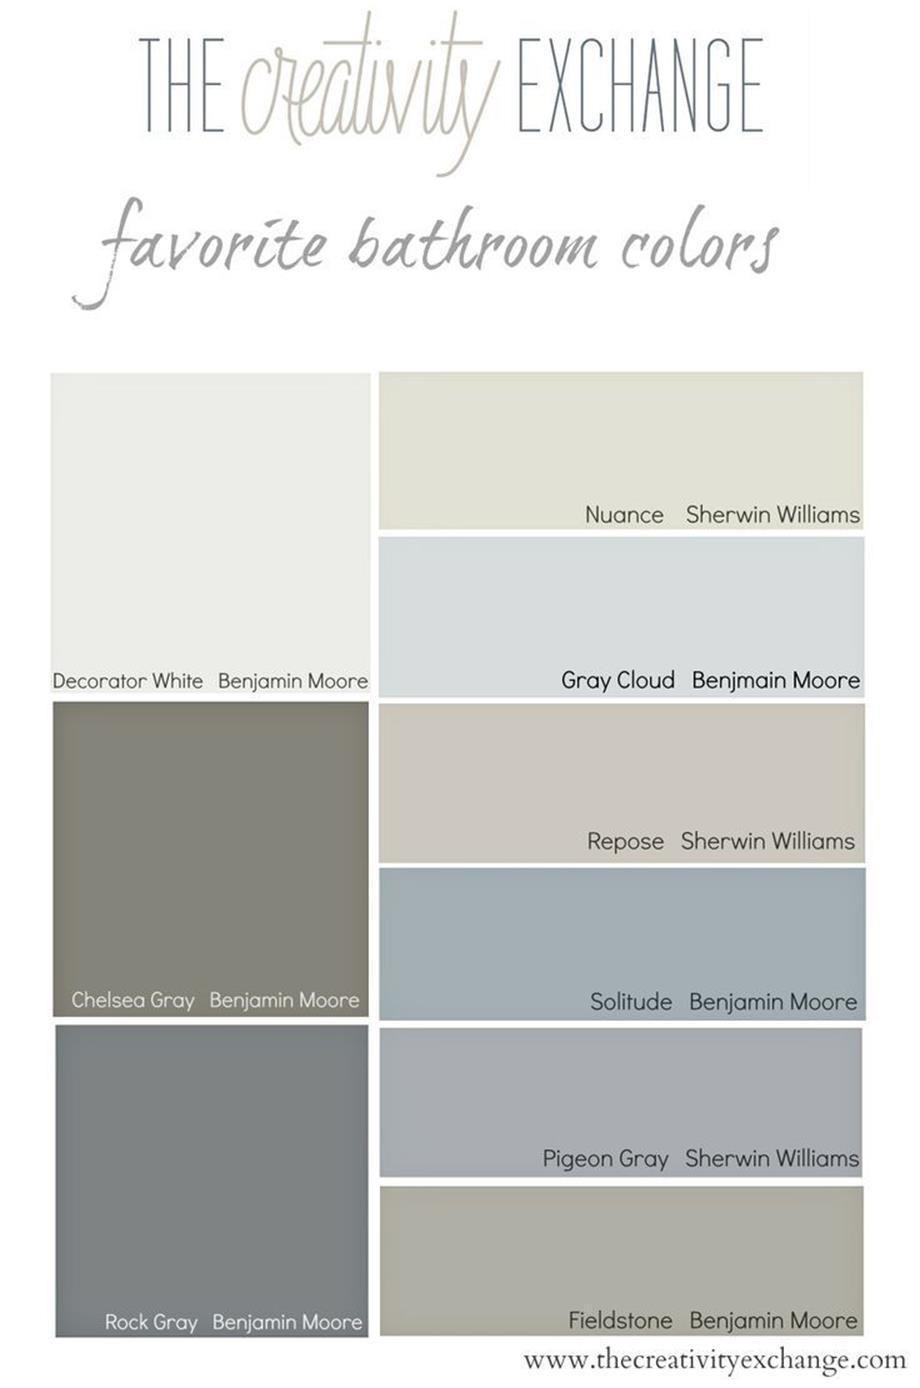 Perfect Warm Neutral Paint Colors For Bathroom 3 Bathroom Wall Colors Bathroom Paint Colors Best Bathroom Colors